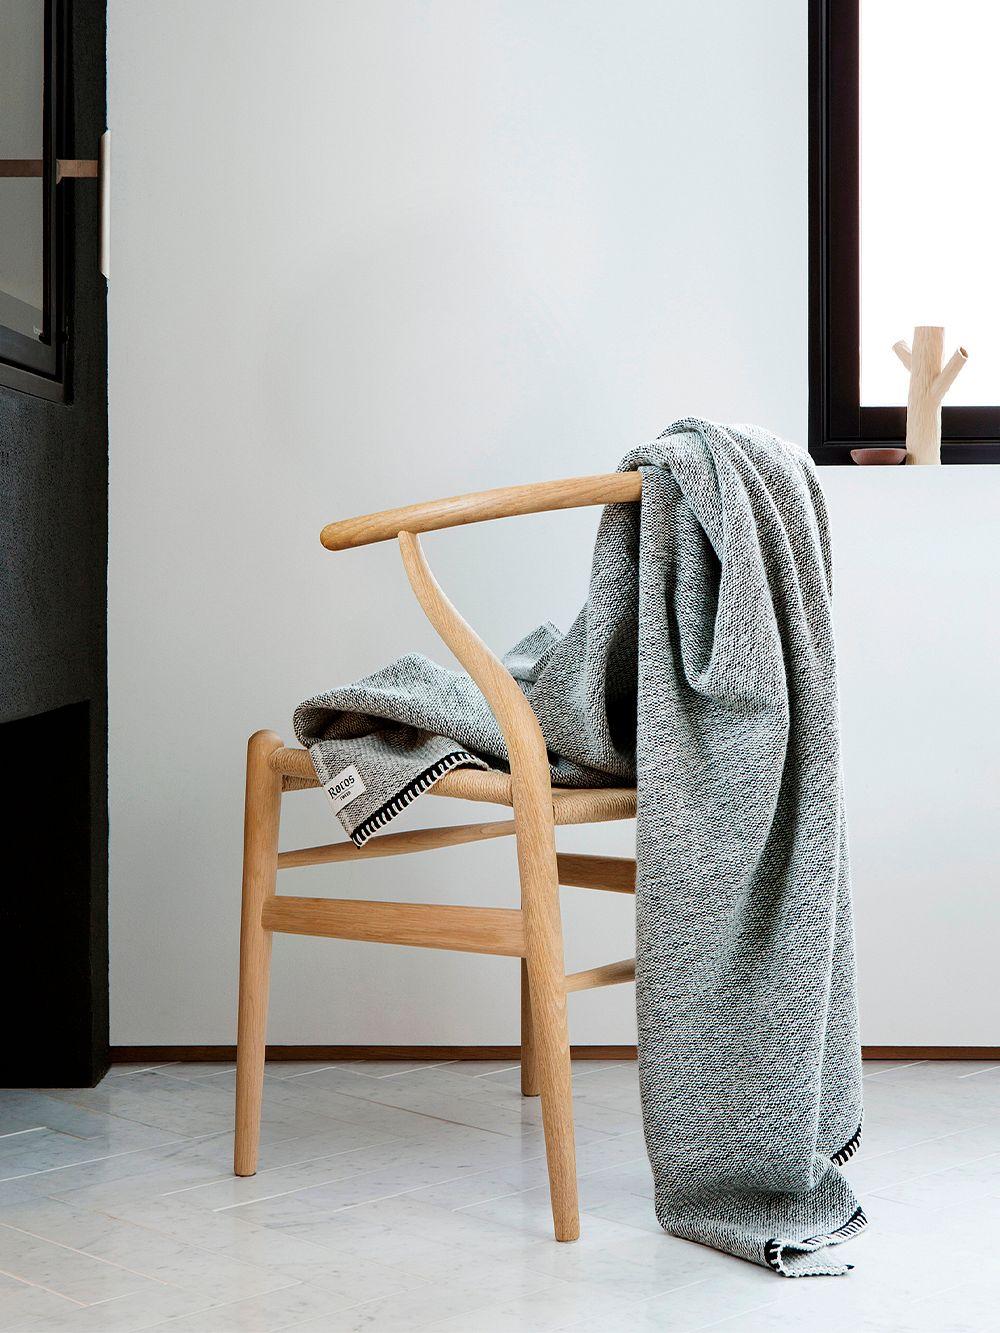 Røros Tweed Picnic viltti, 200 x 150 cm, luonnonvärinen